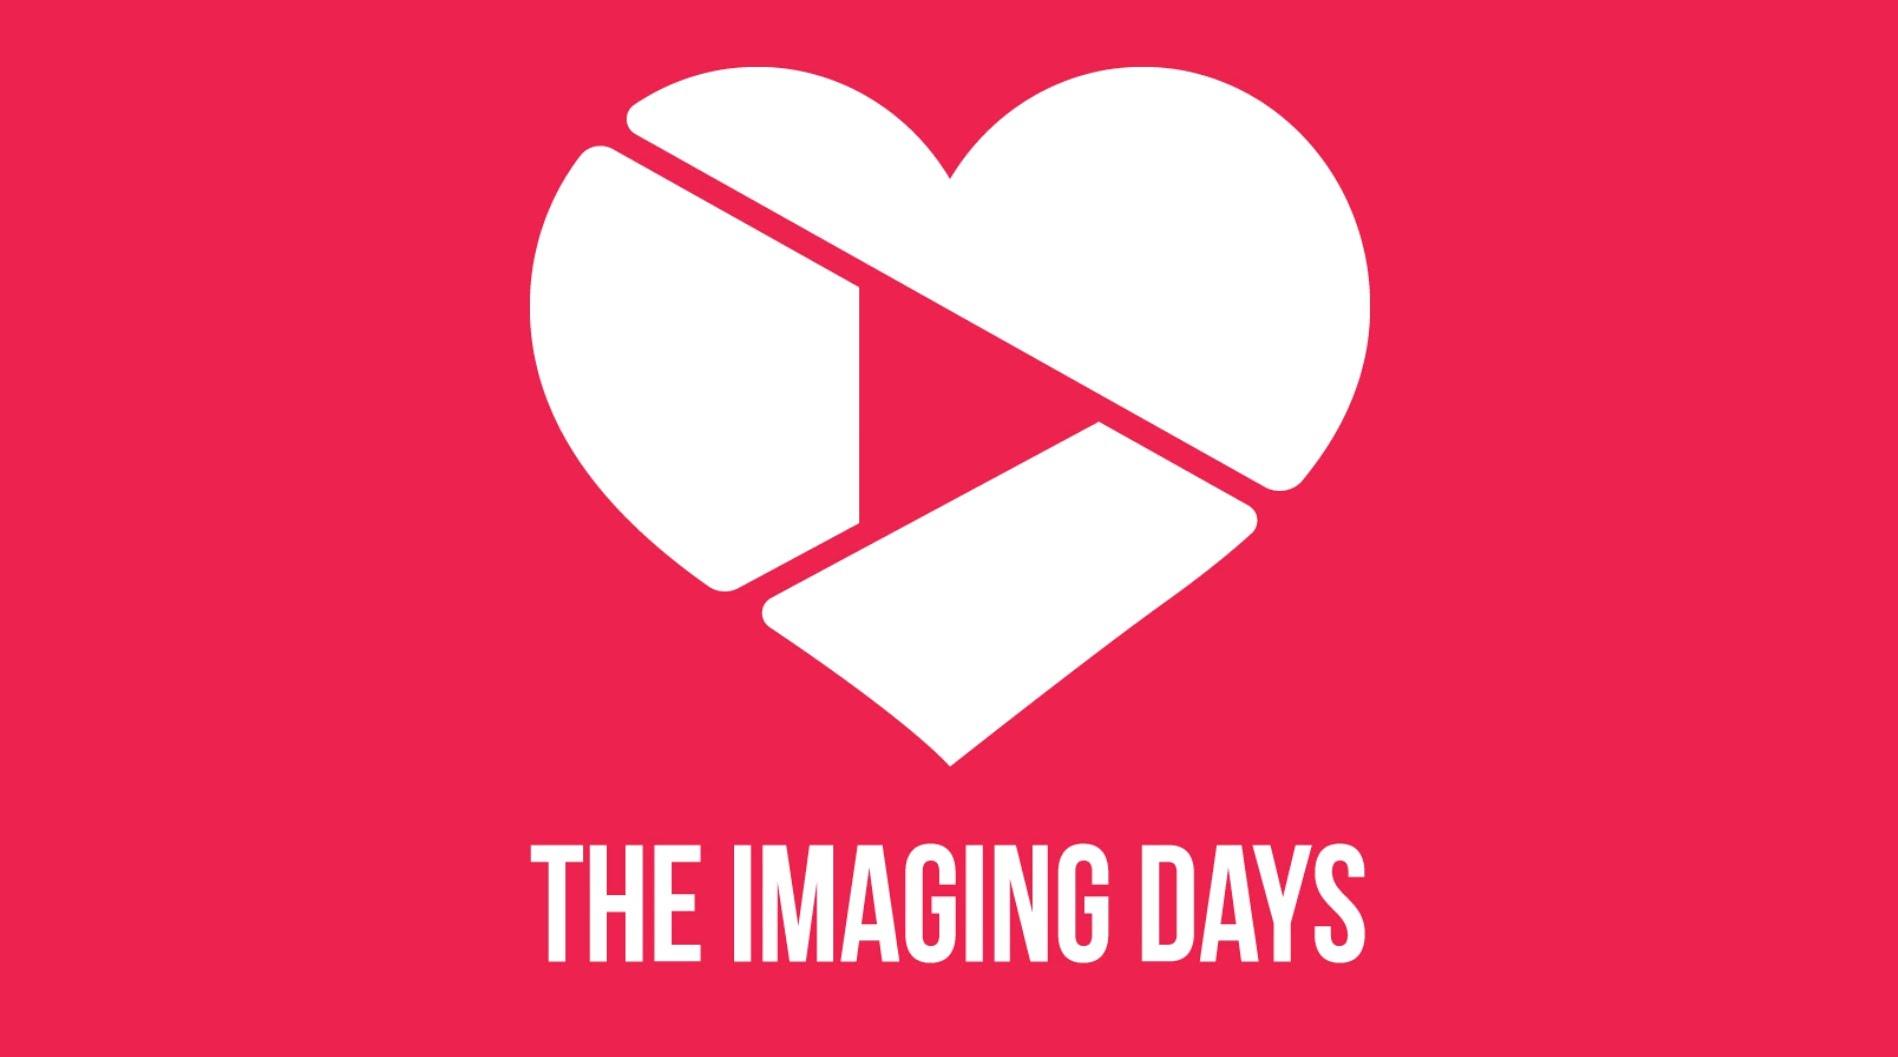 Imaging days conference producer panel presentation video